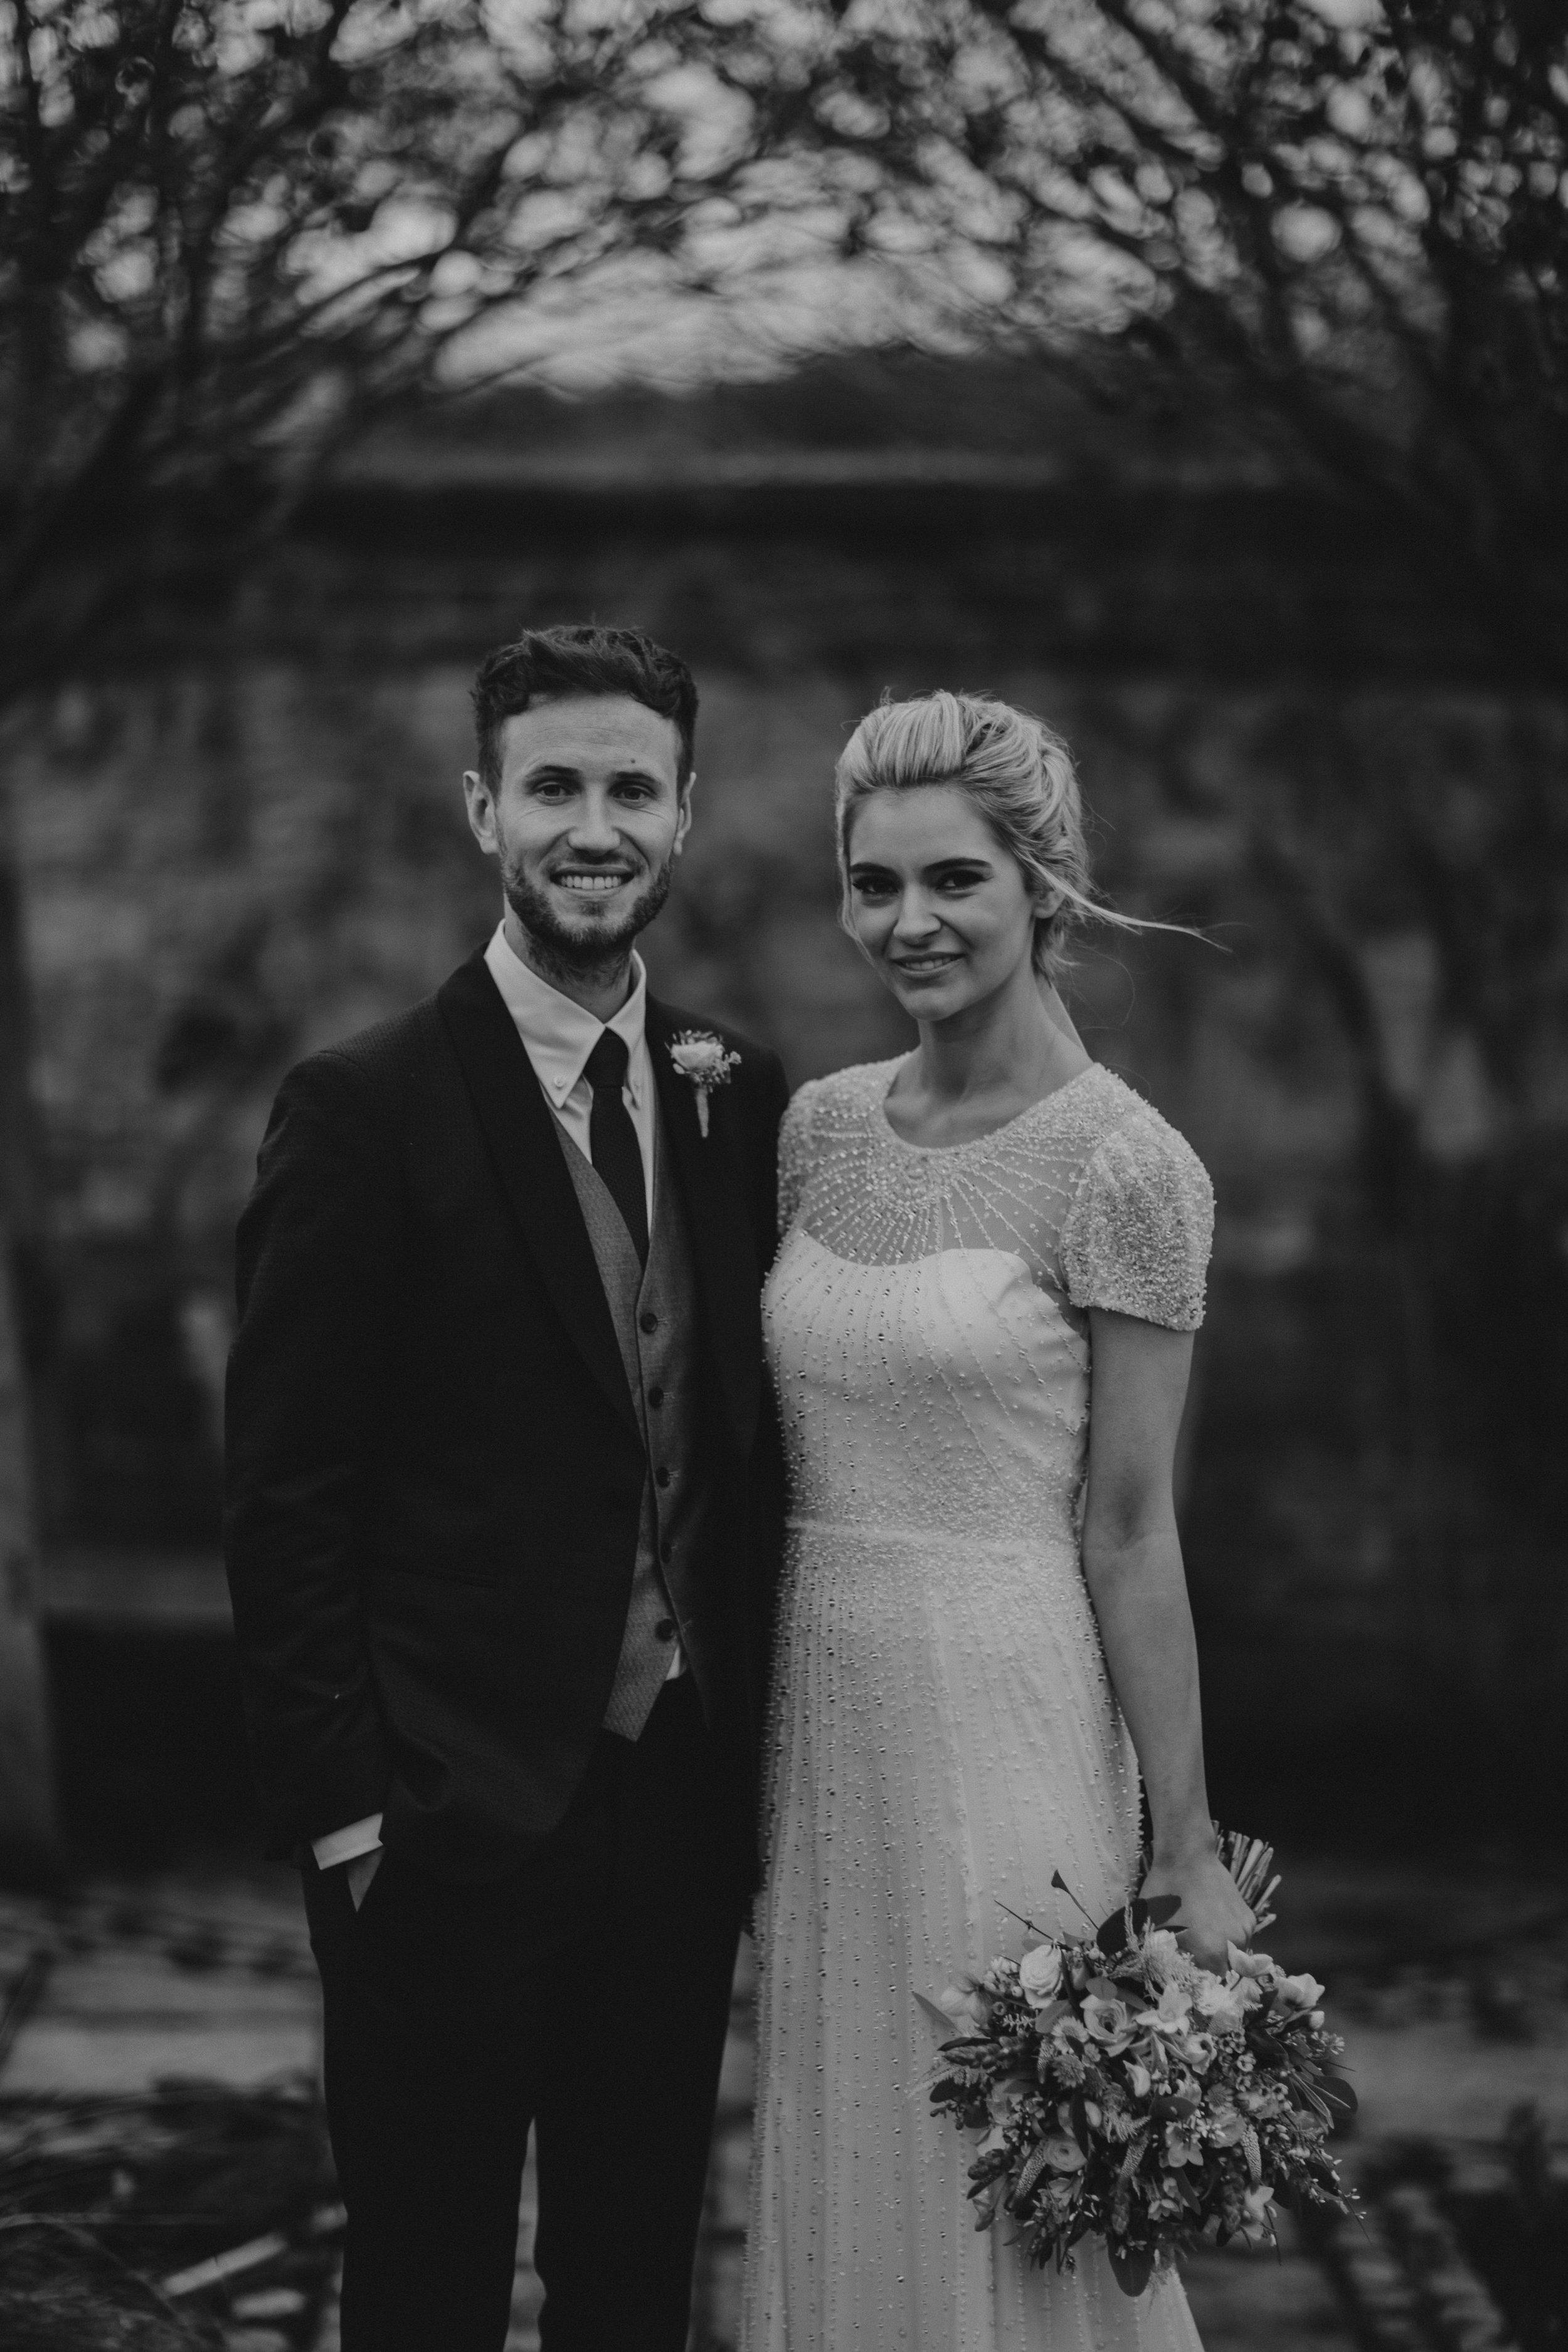 London_wedding_photographer_gione_da_silva_carelle_paul162.jpg